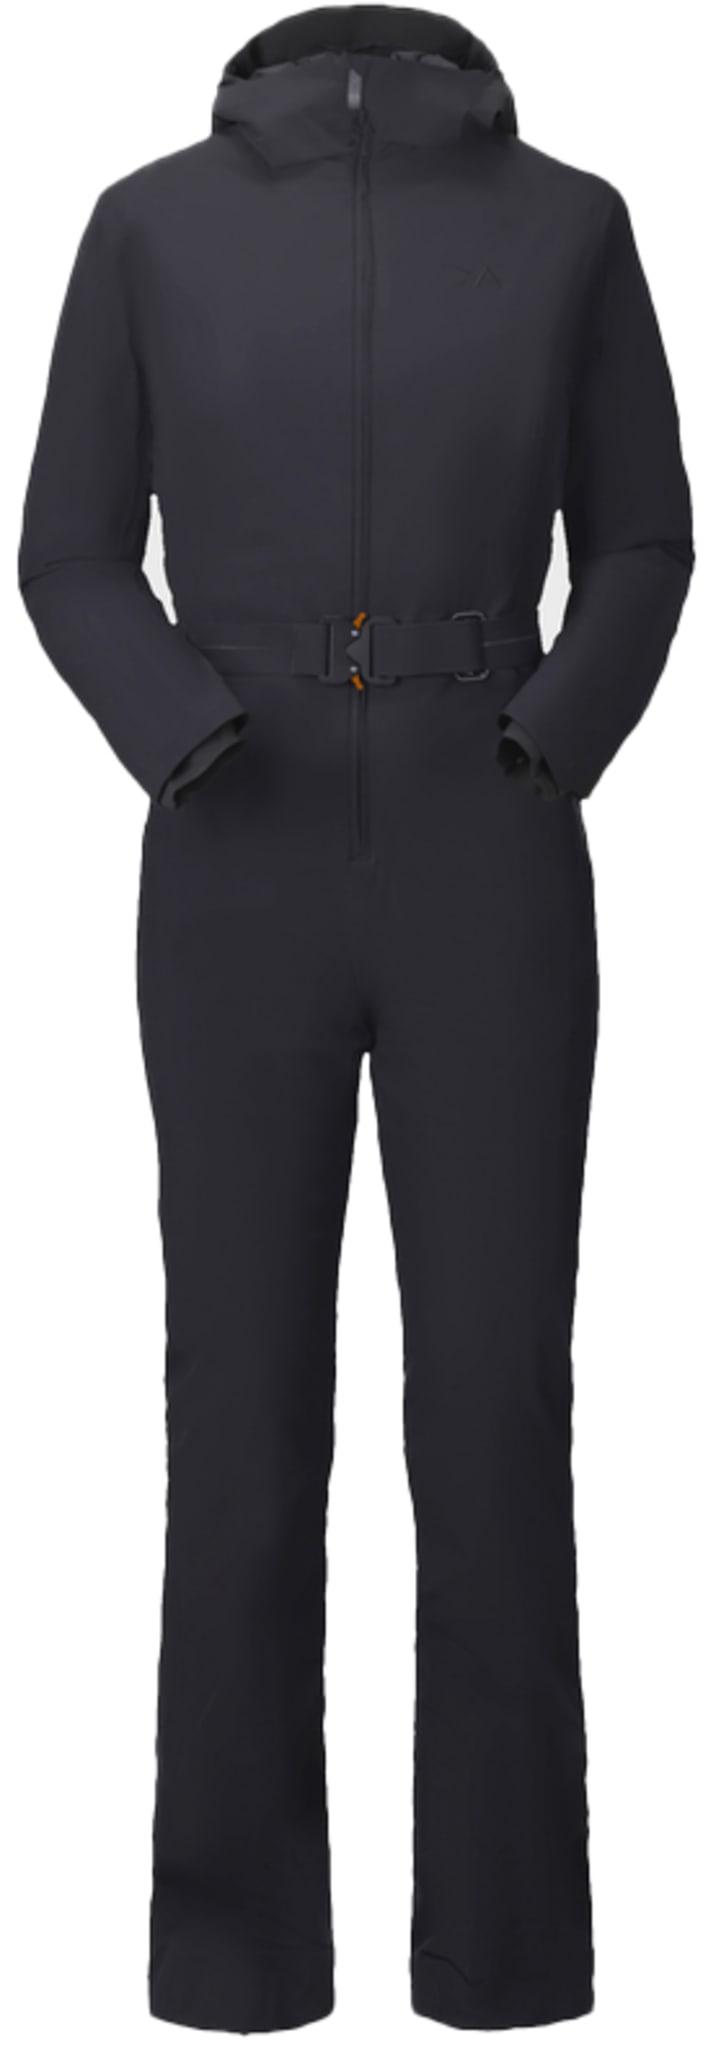 Curve Stretch Suit W